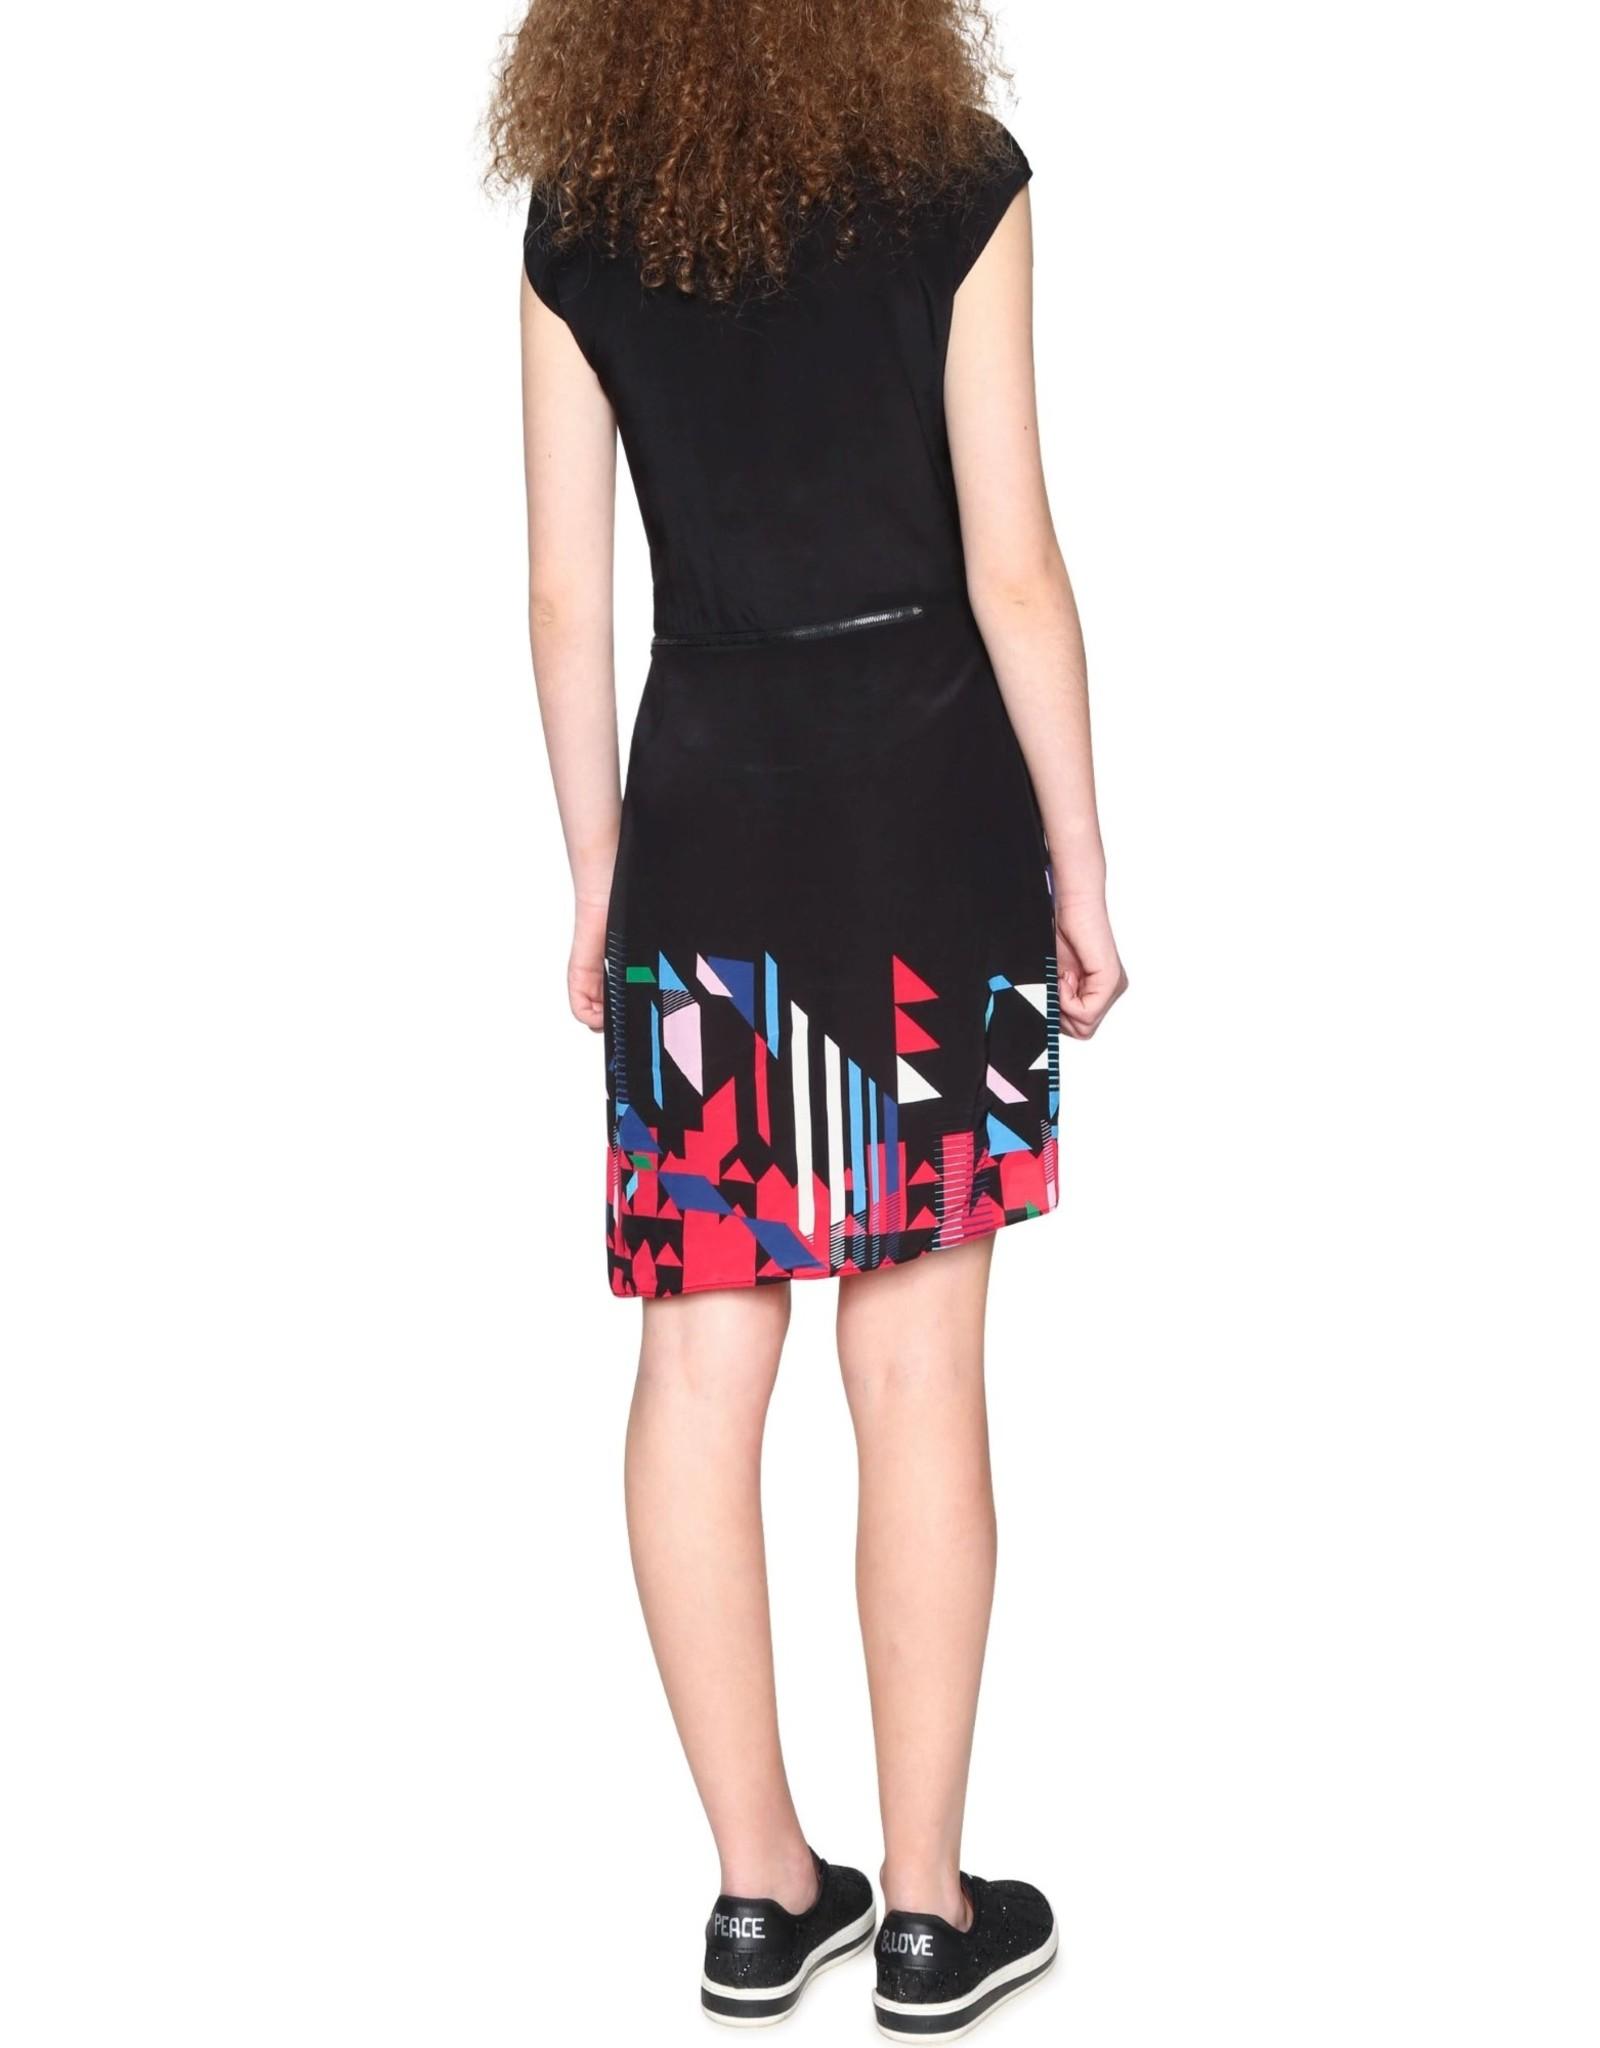 Desigual Desigual Dress Nicolas Size 38